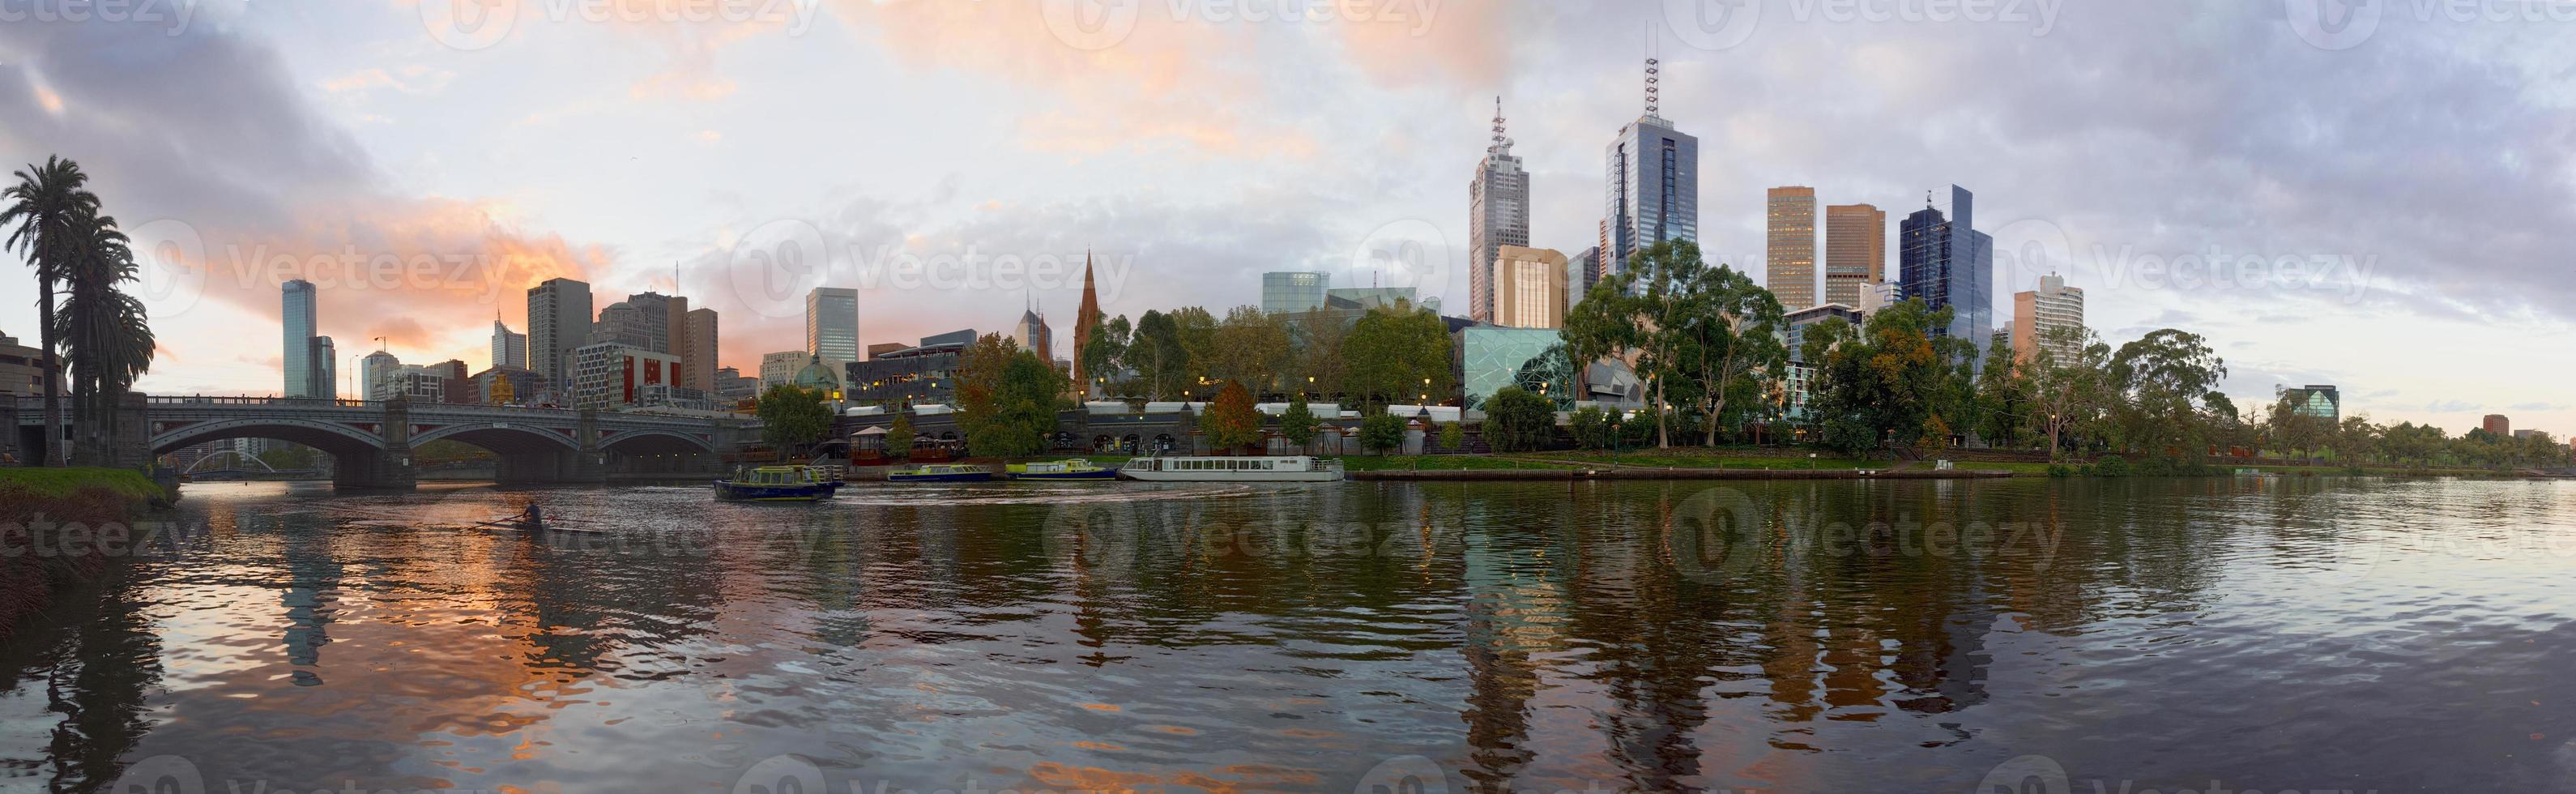 melbourne och yarra-floden foto